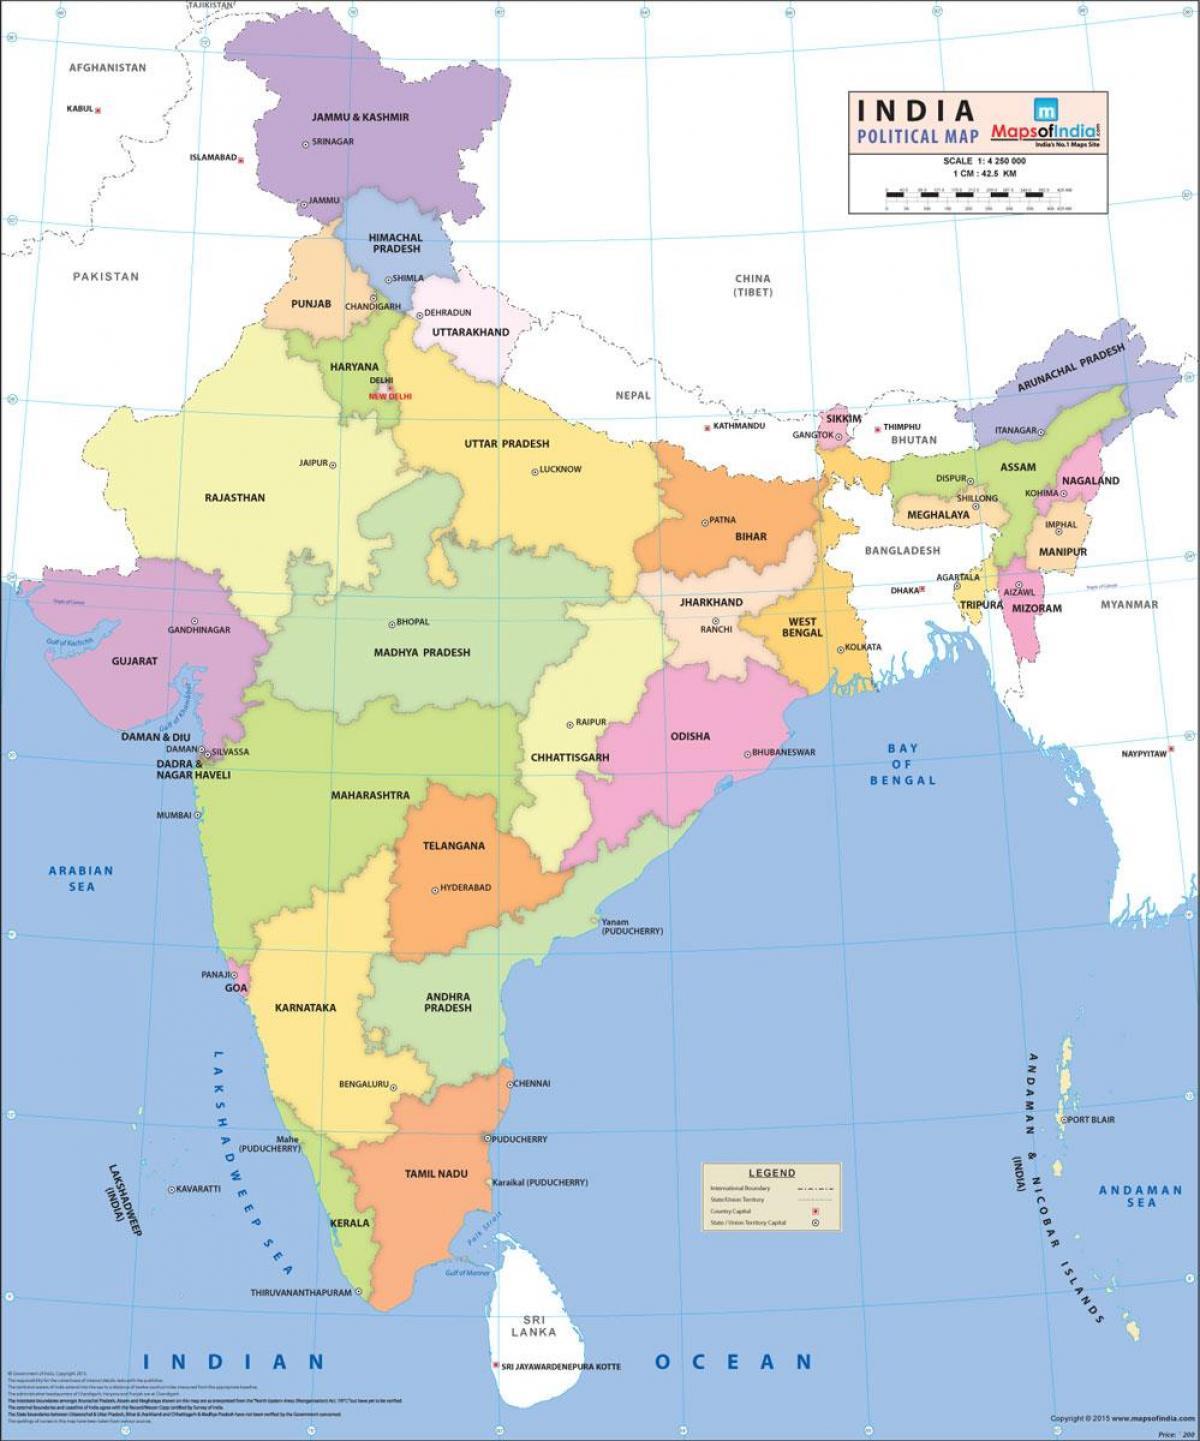 Politische Karte Asien.Indien Politische Karte Indien Politische Karte Süd Asien Asia